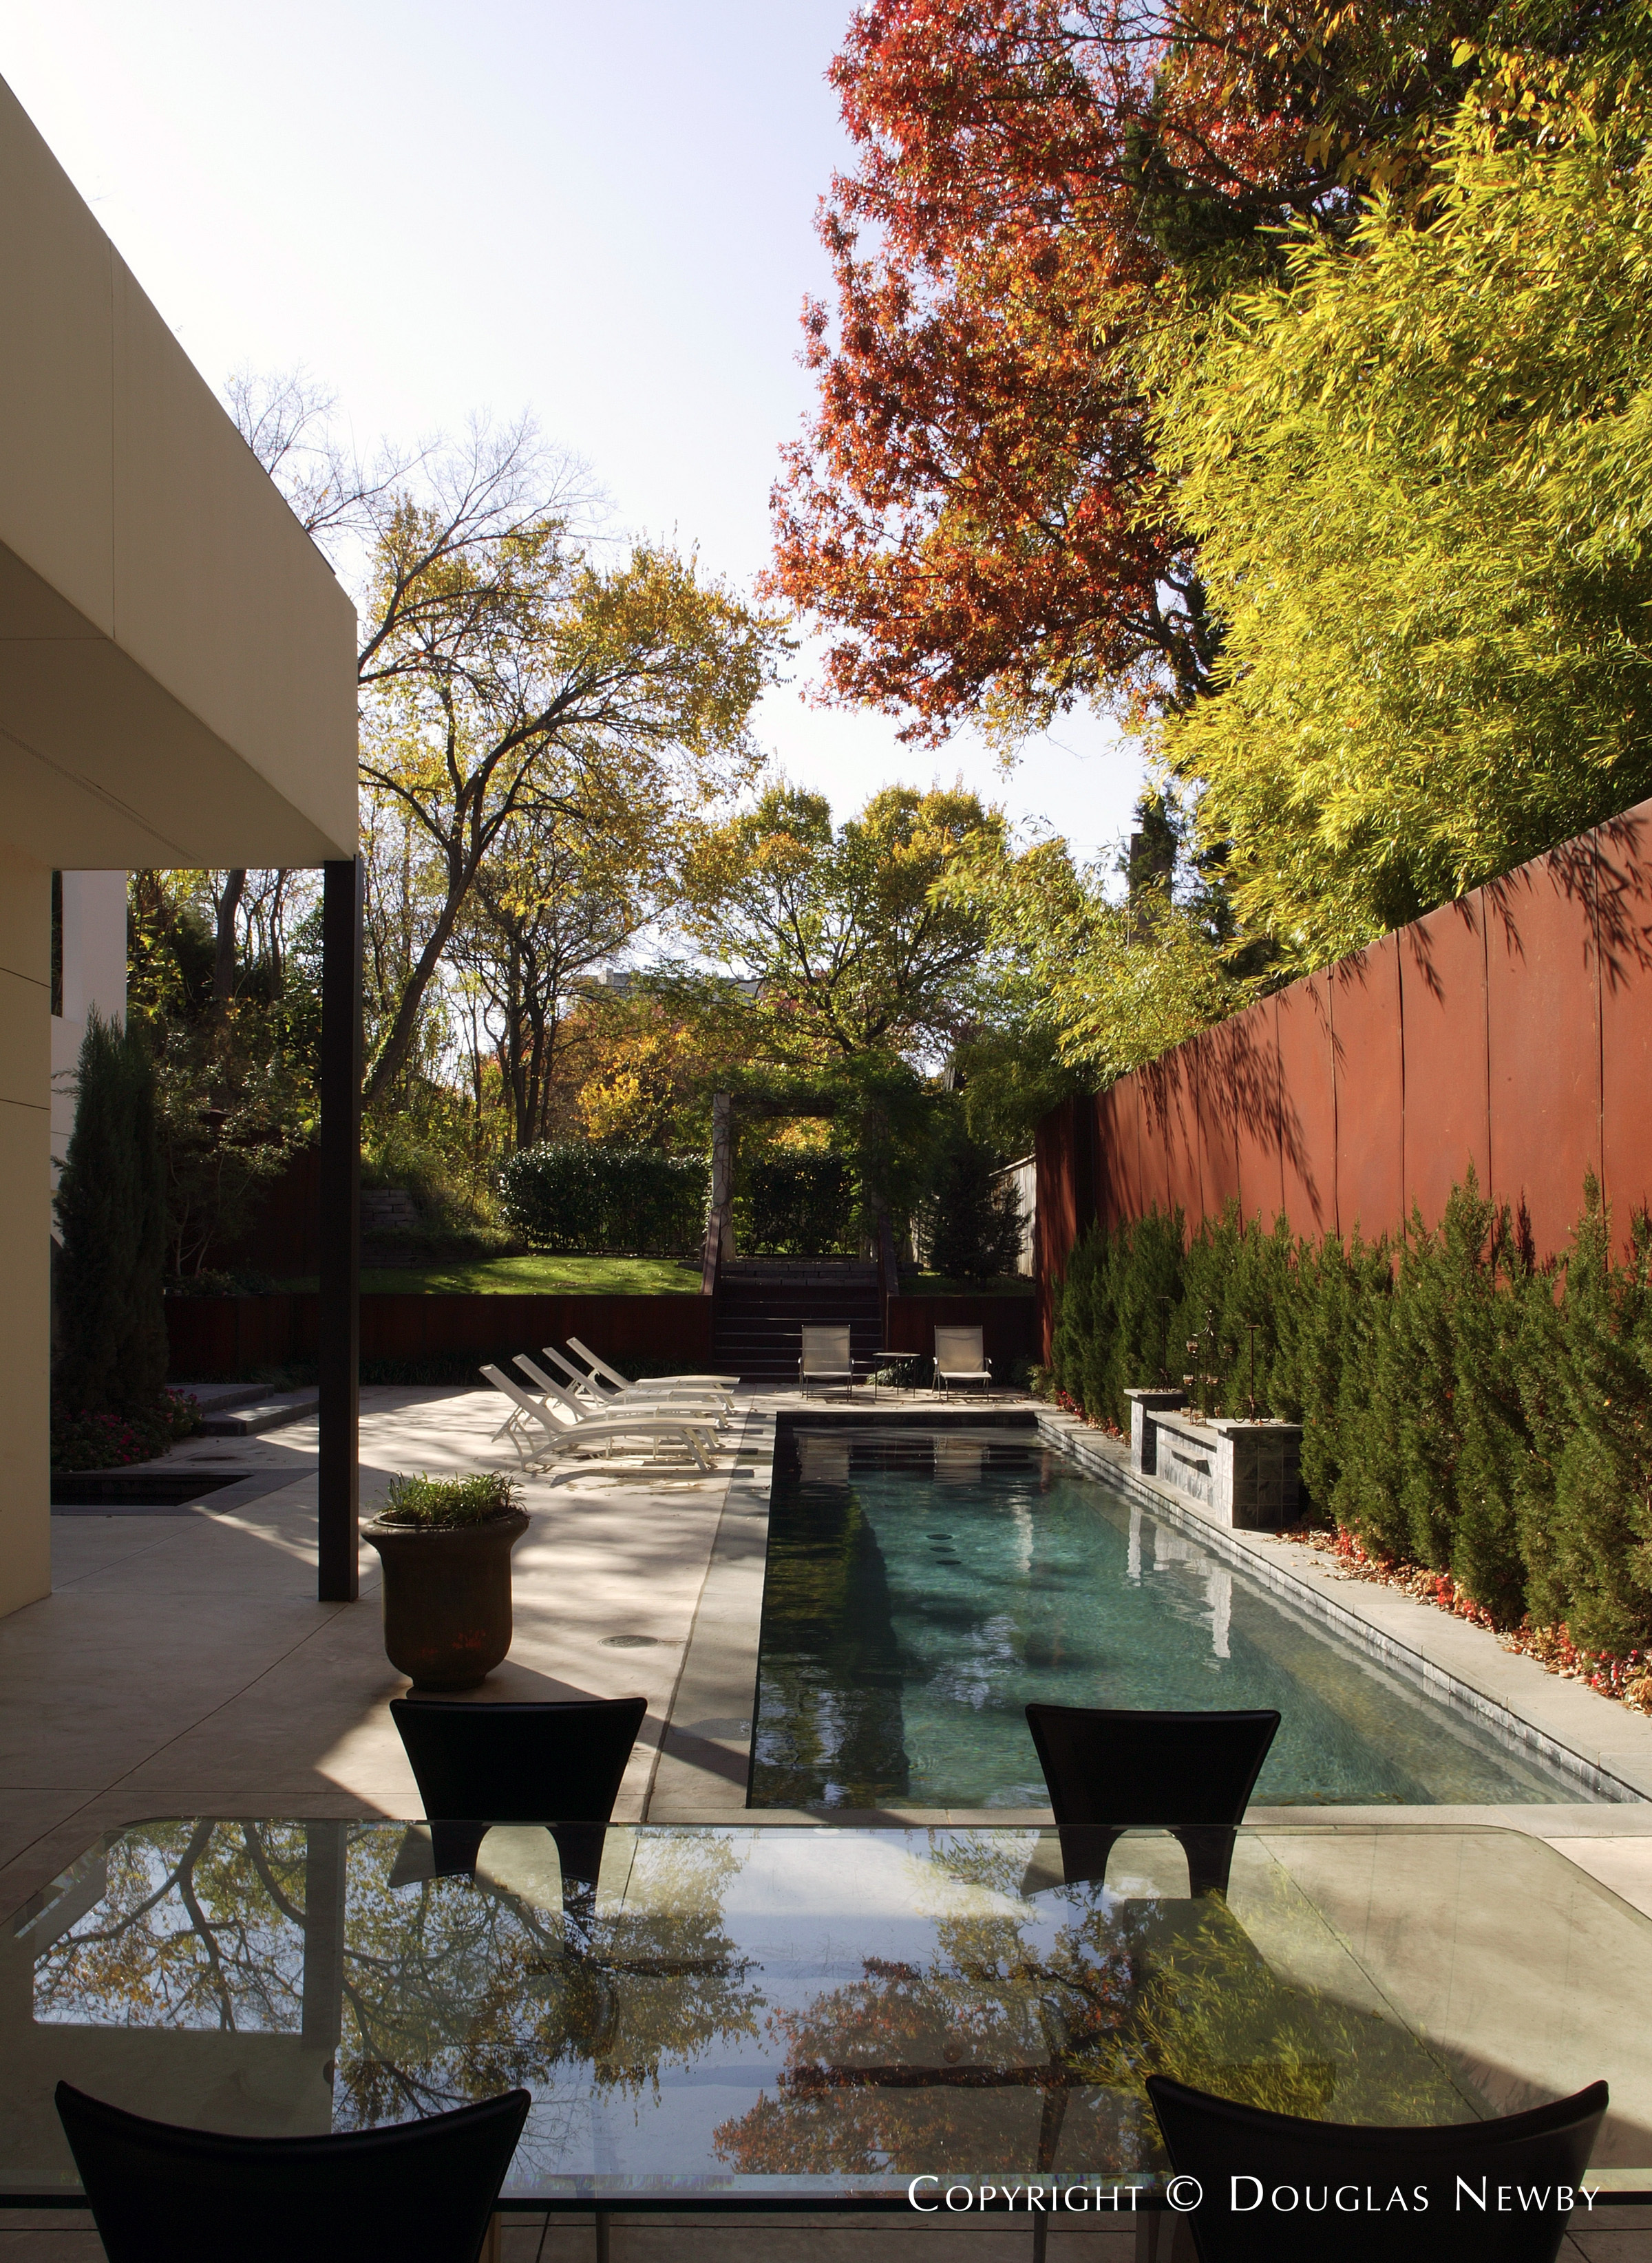 Turtle Creek Corridor Real Estate on 0.3769 Acres